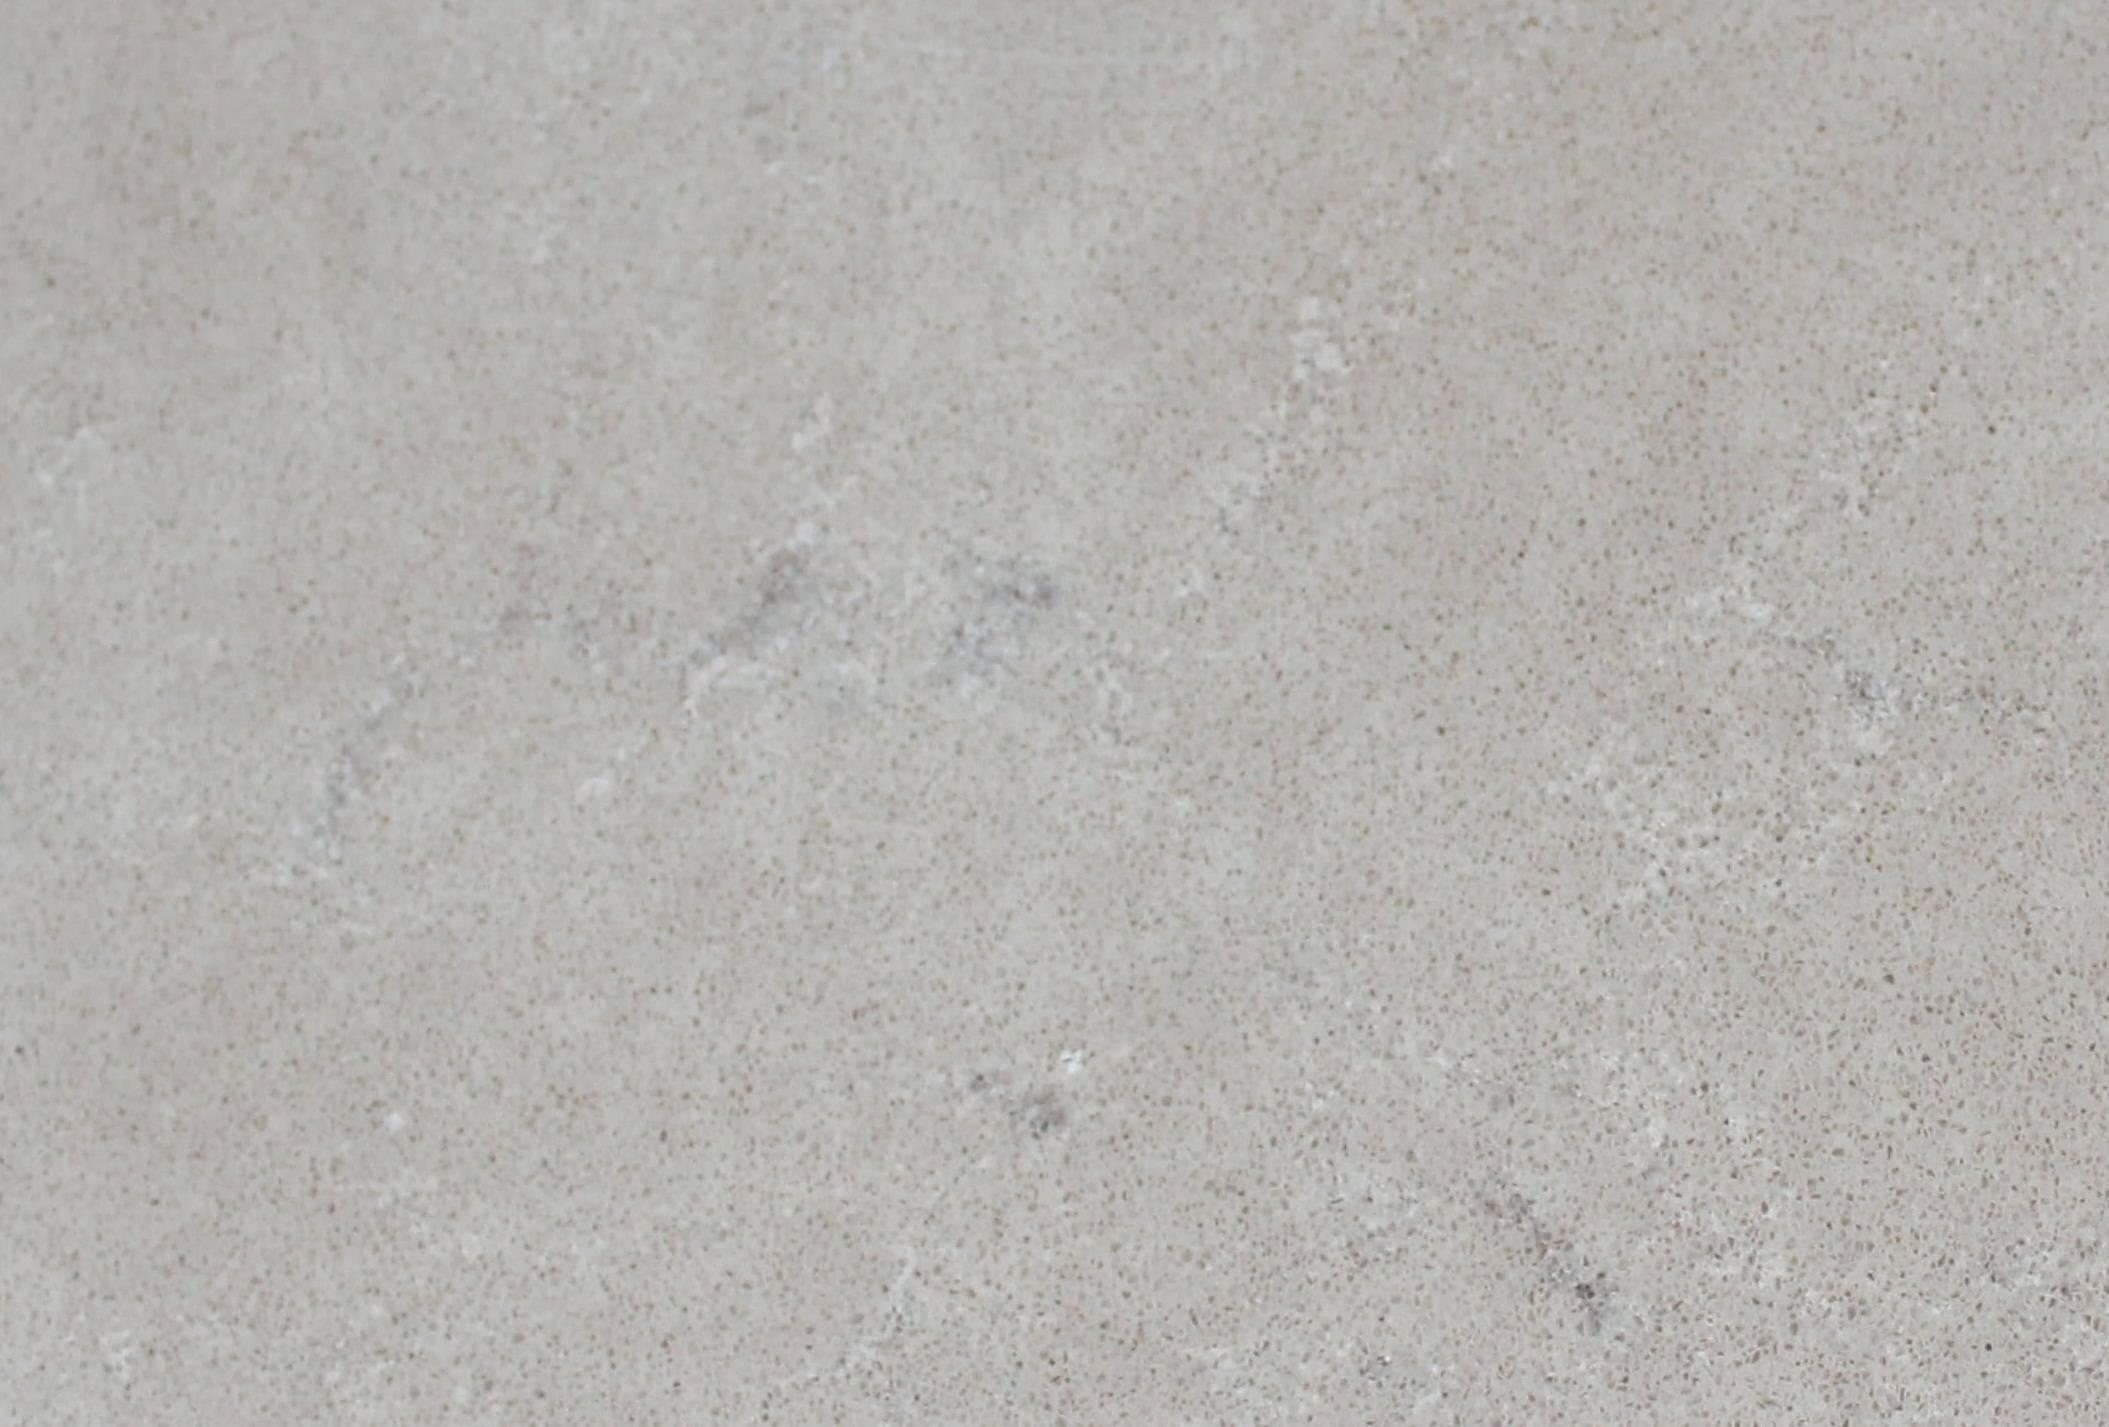 Boletus фото 1 — камень от Bevers Marmyr